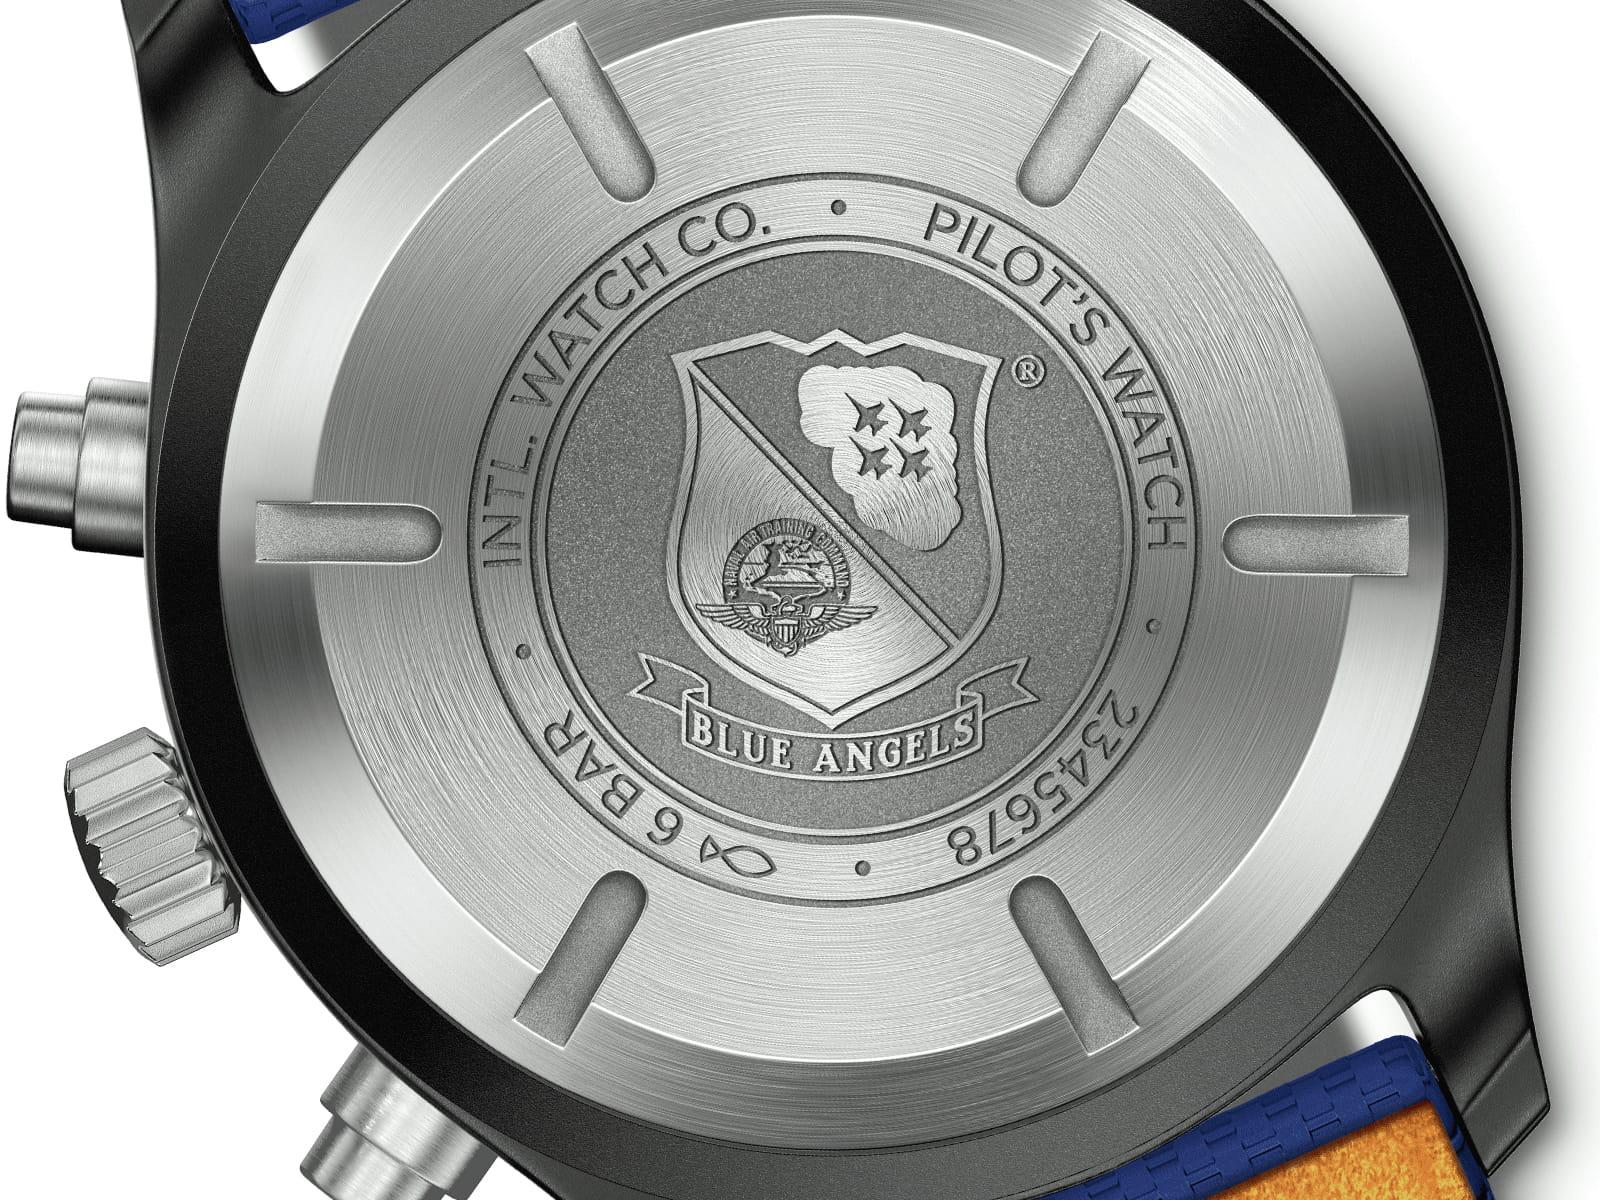 iw389008-iwc-schaffhausen-pilot-s-watch-chronograph-edition-blue-angels-8.jpg